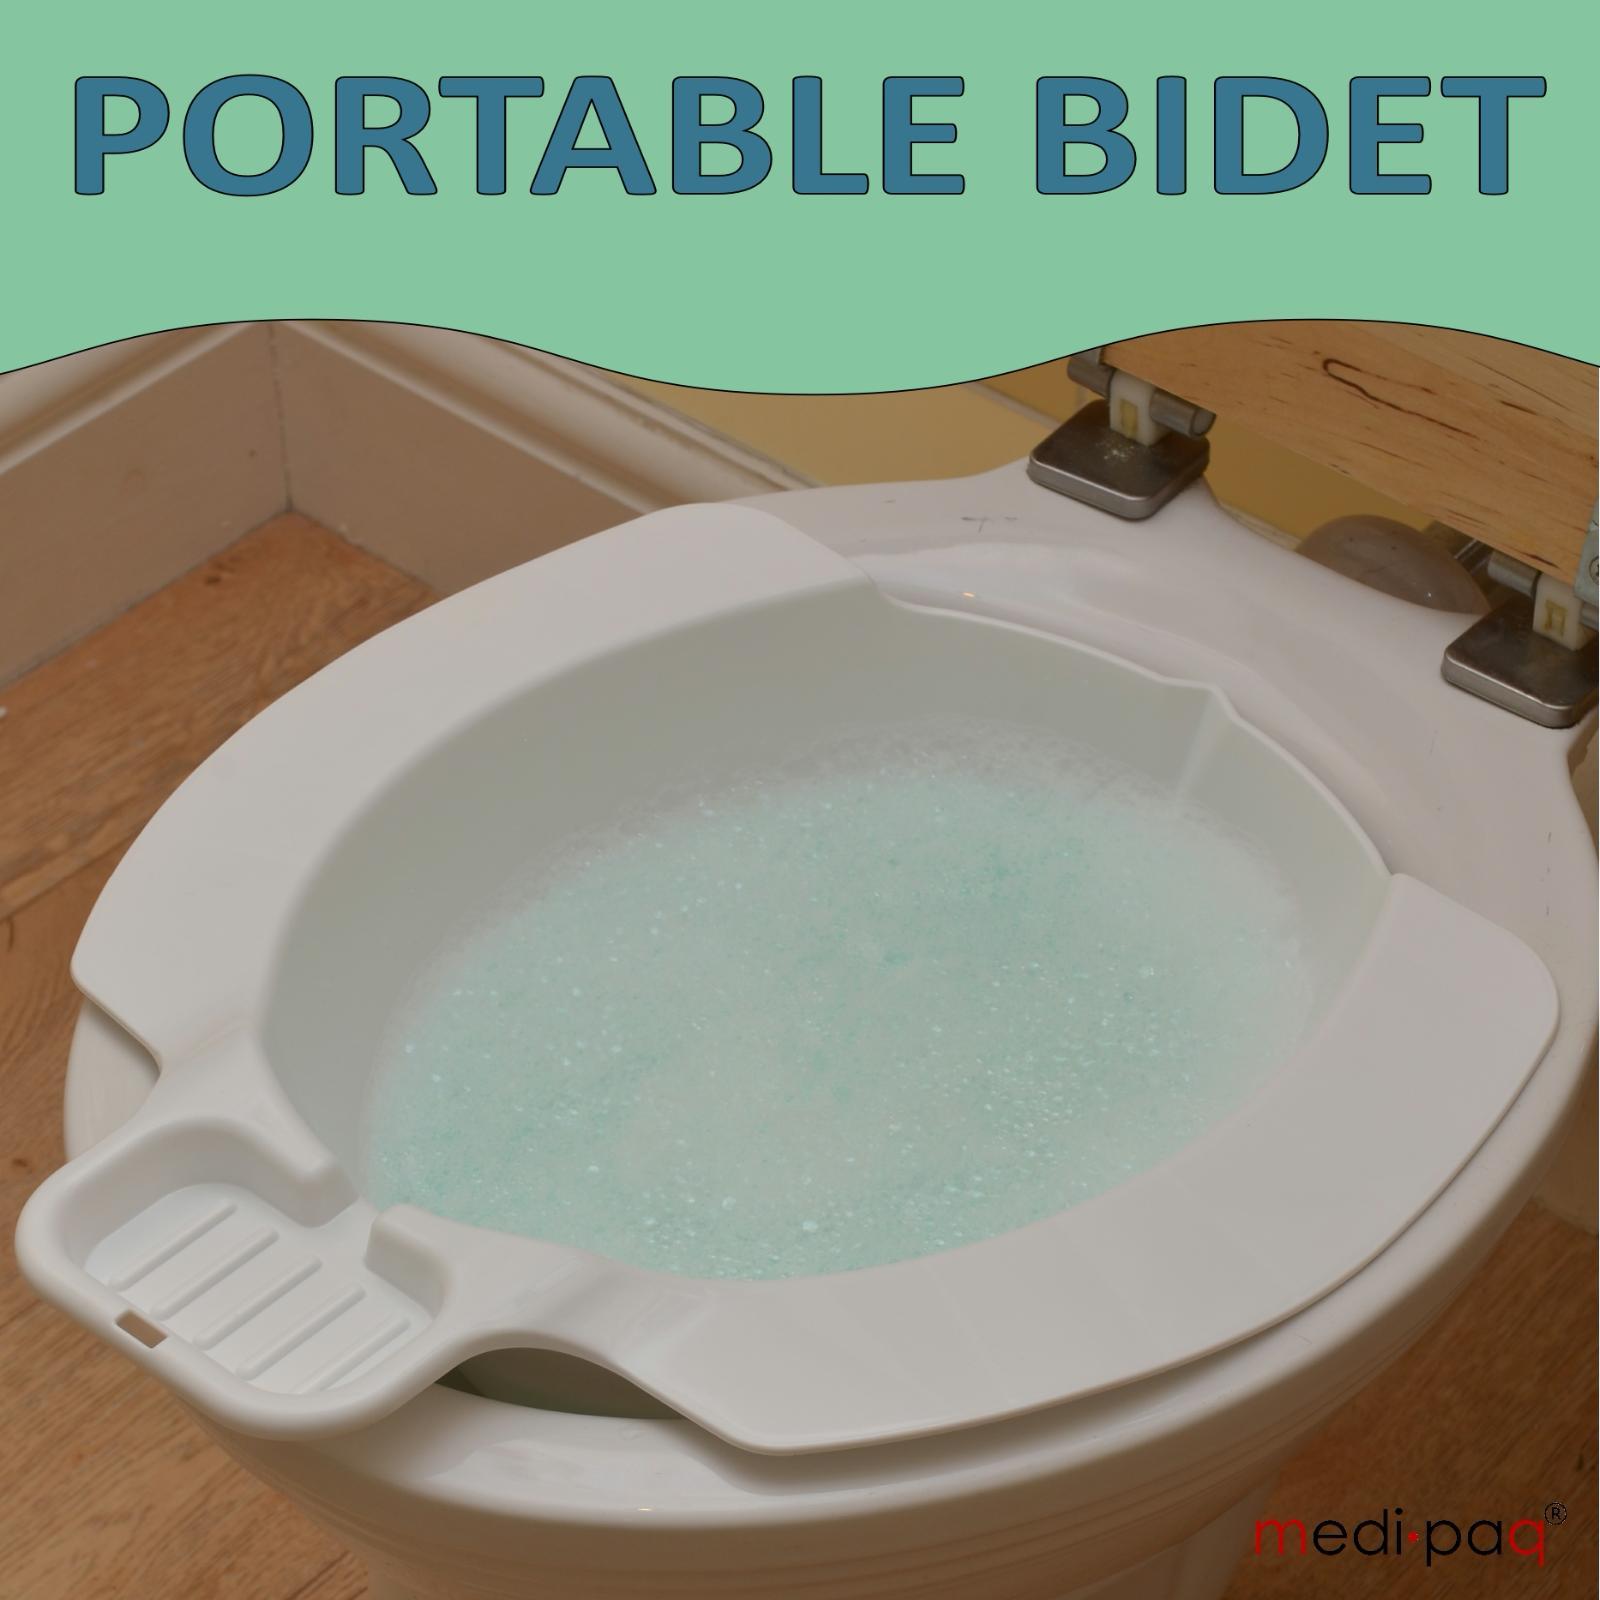 Bidet Portable Personal Hygiene Toilet Loo Car Camping